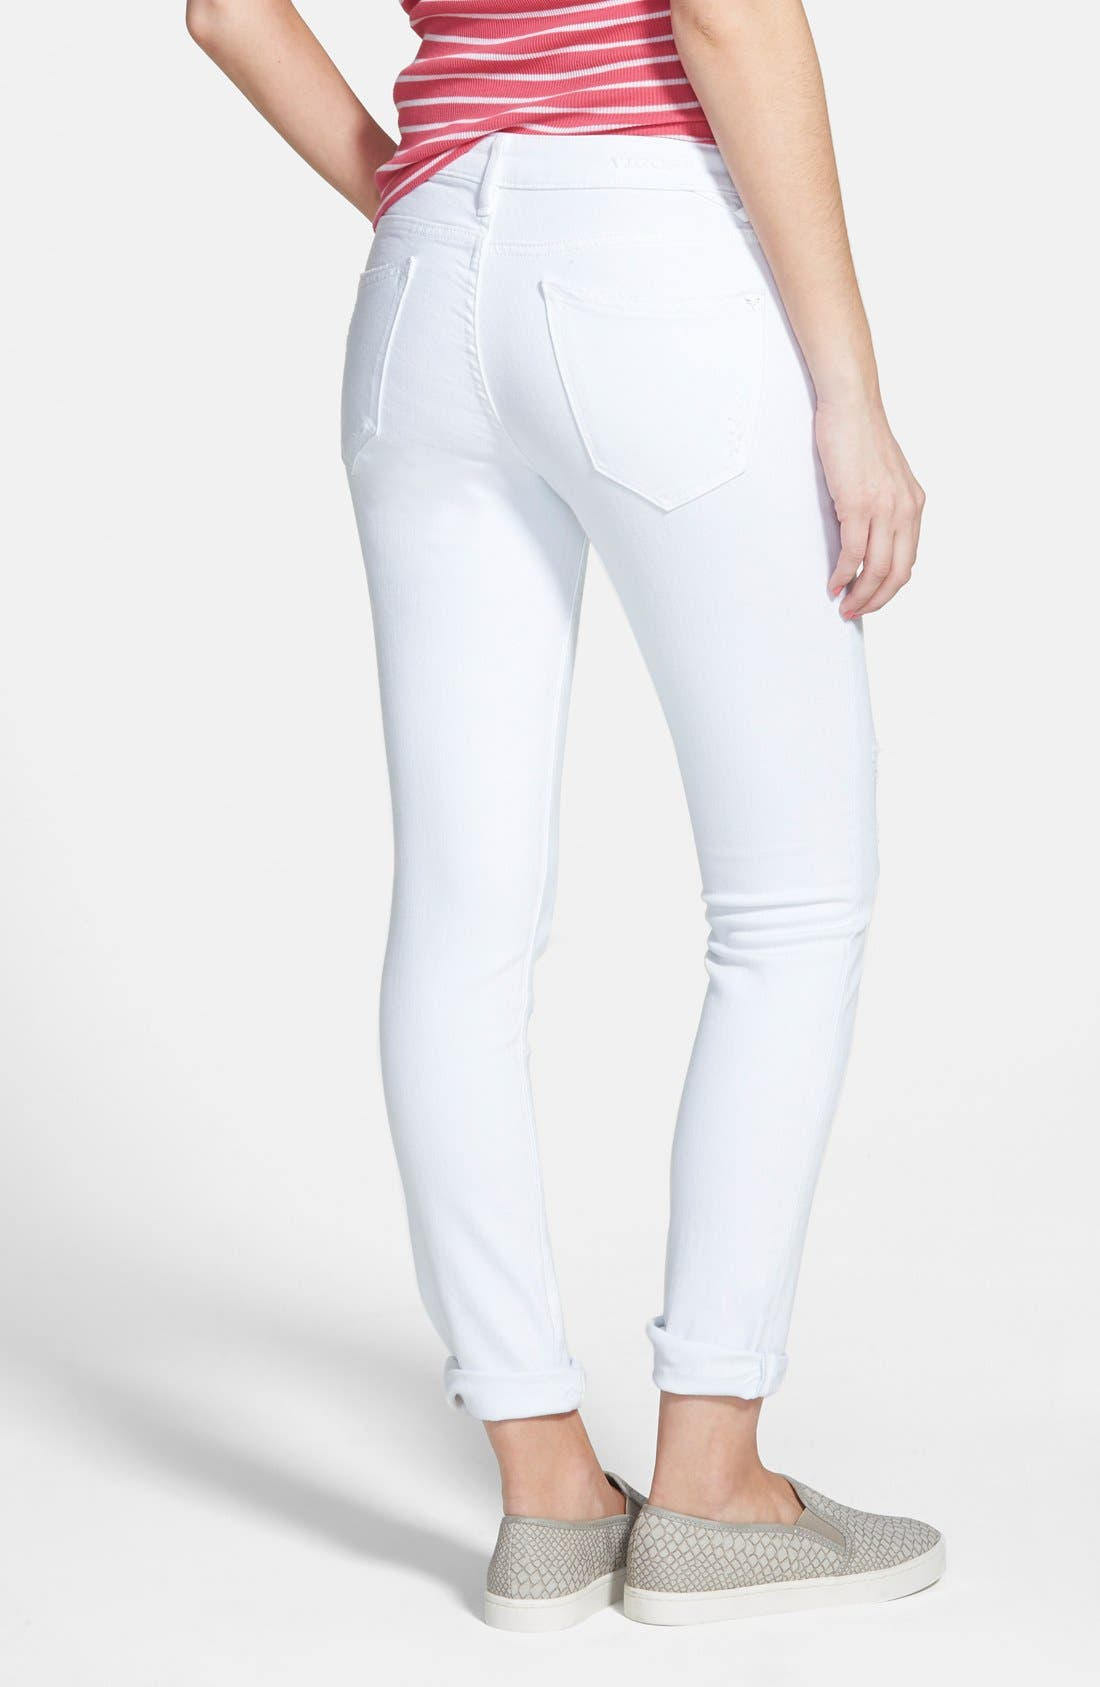 Alternate Image 2  - Vigoss 'Tomboy' Destroyed Crop Skinny Jeans (White)